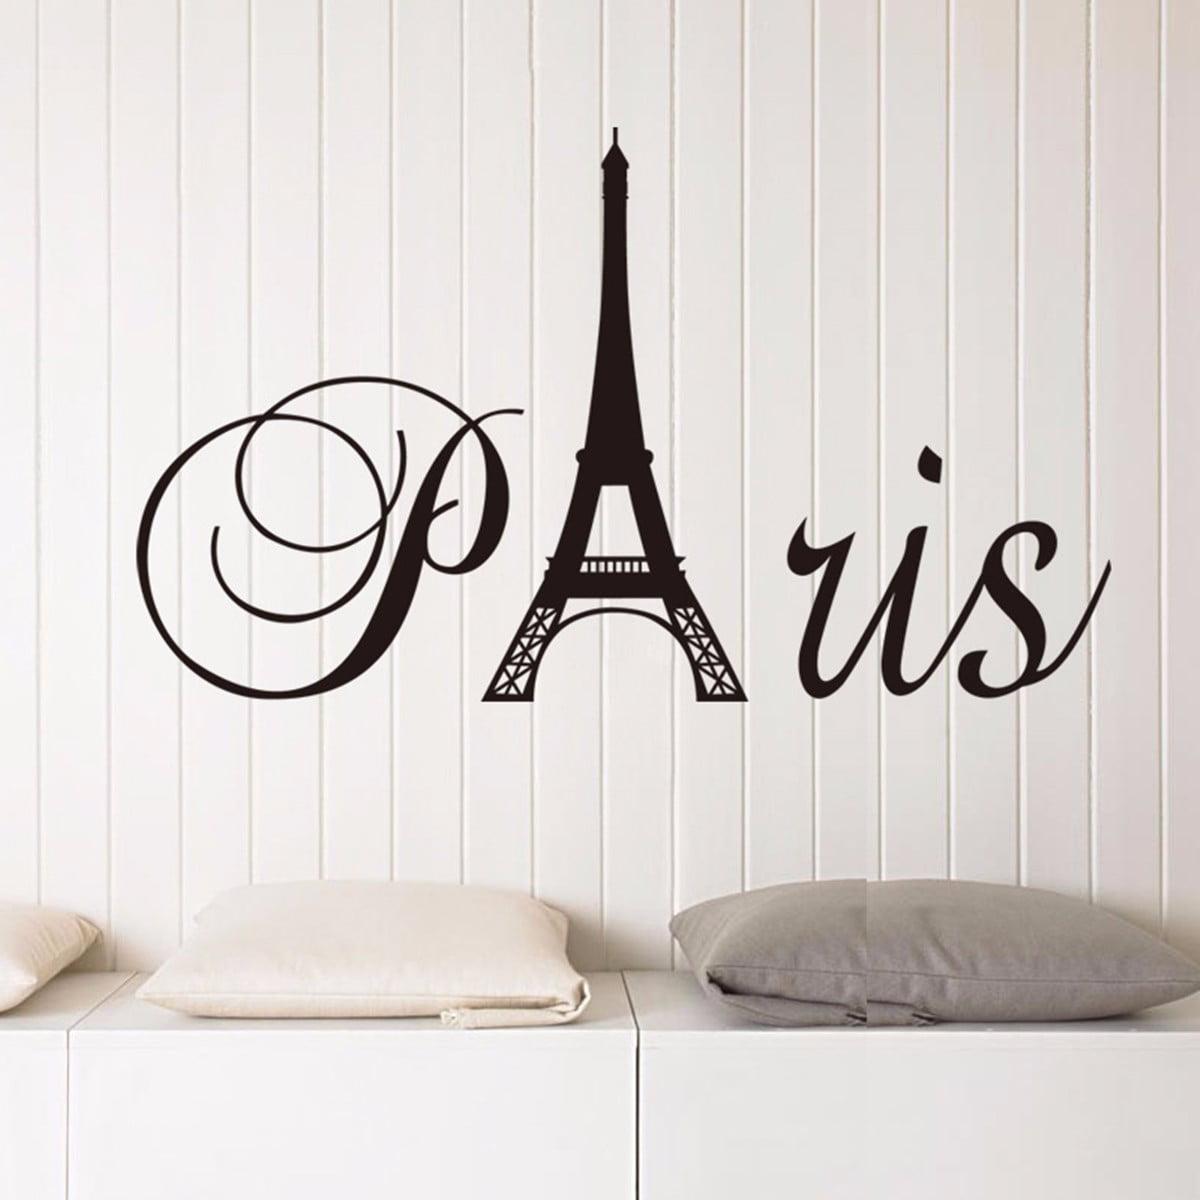 Removable France Paris Eiffel Tower Wall Sticker Pvc Vinyl Decal